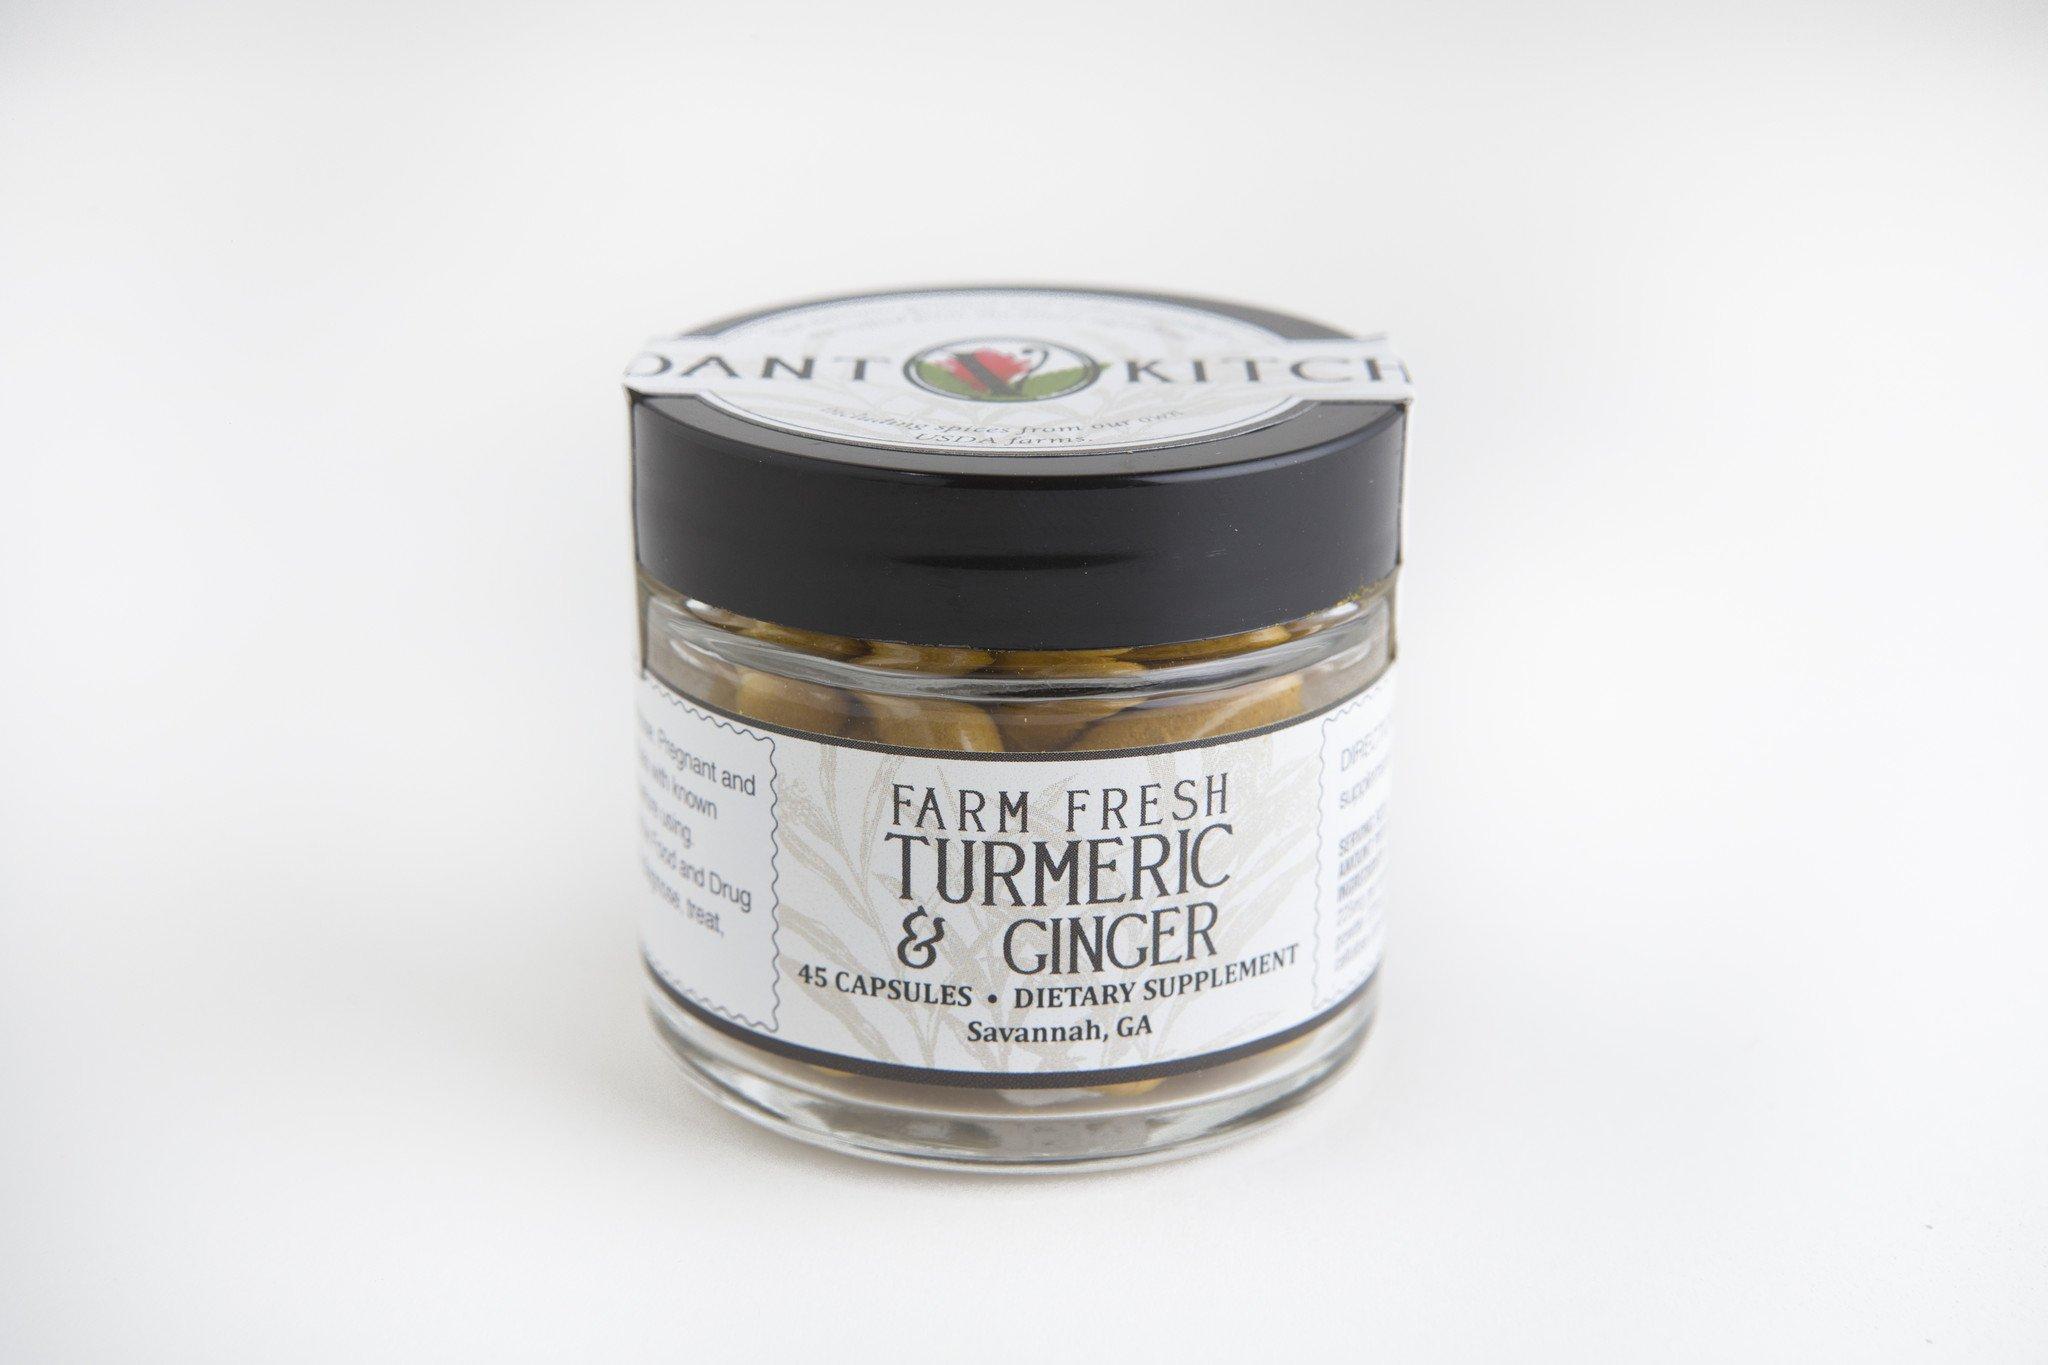 Farm Fresh Turmeric & Ginger Capsules 45